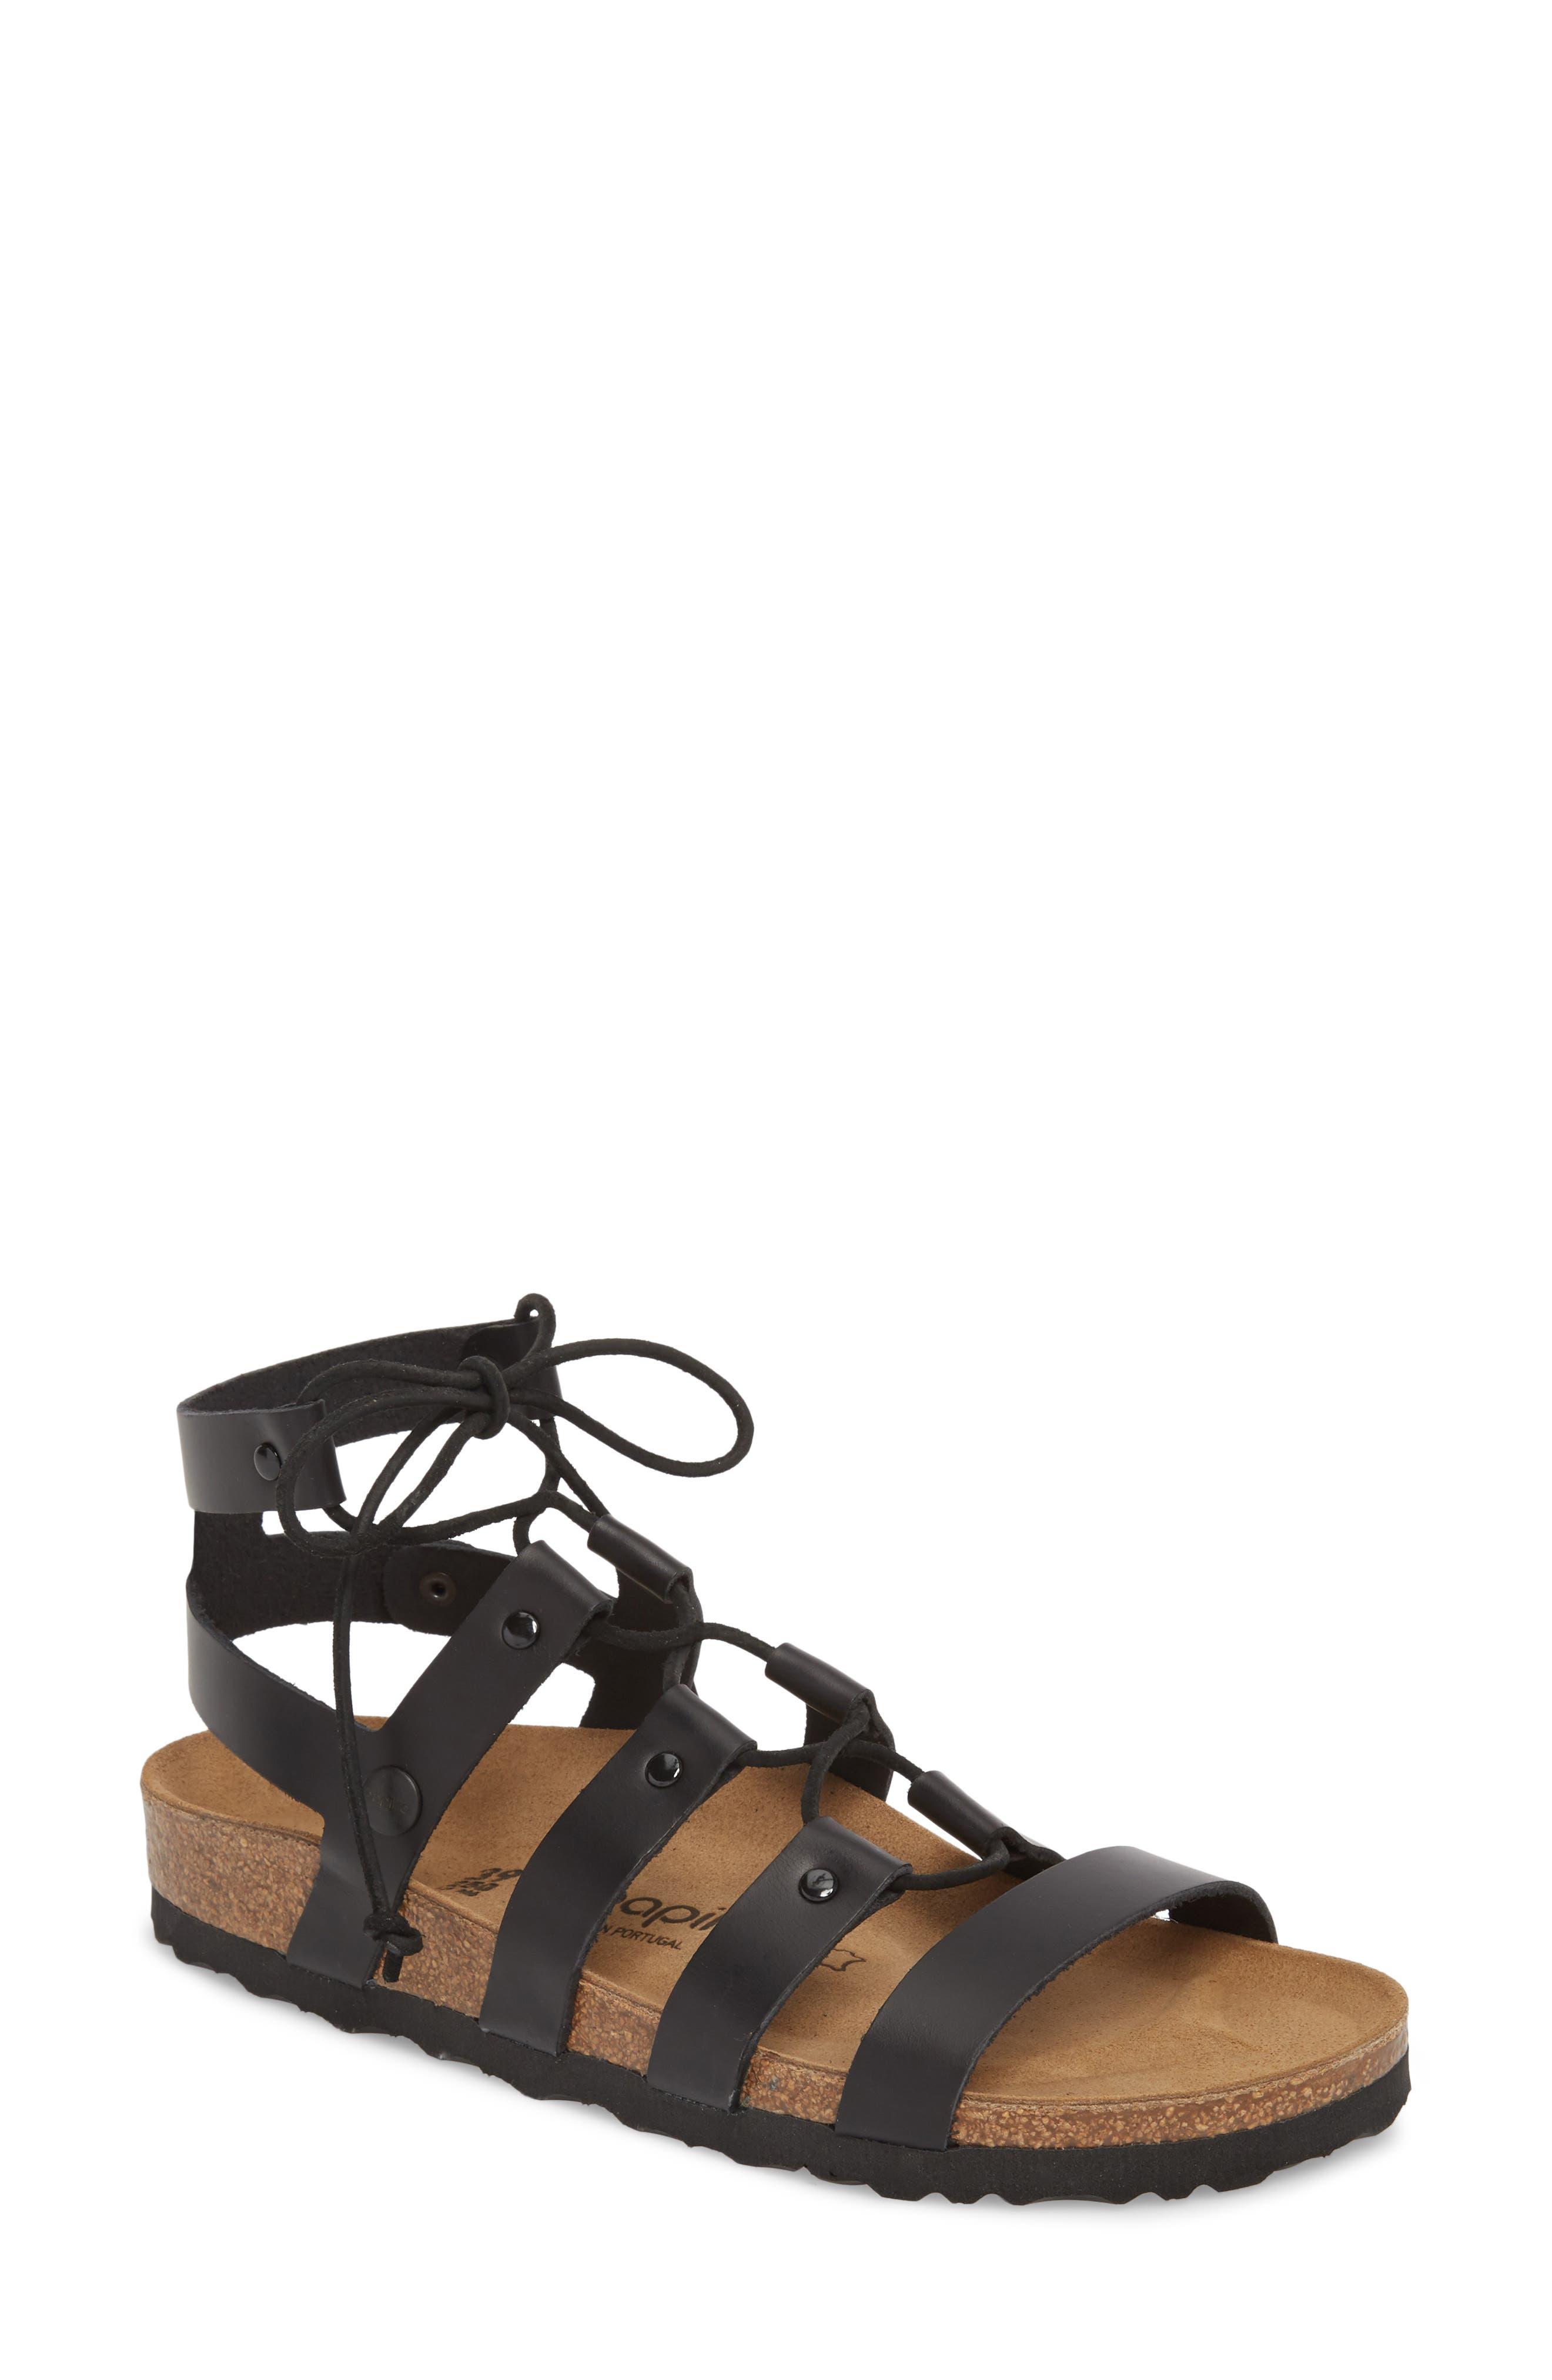 Papillio by Birkenstock Cleo Gladiator Sandal,                         Main,                         color, 001